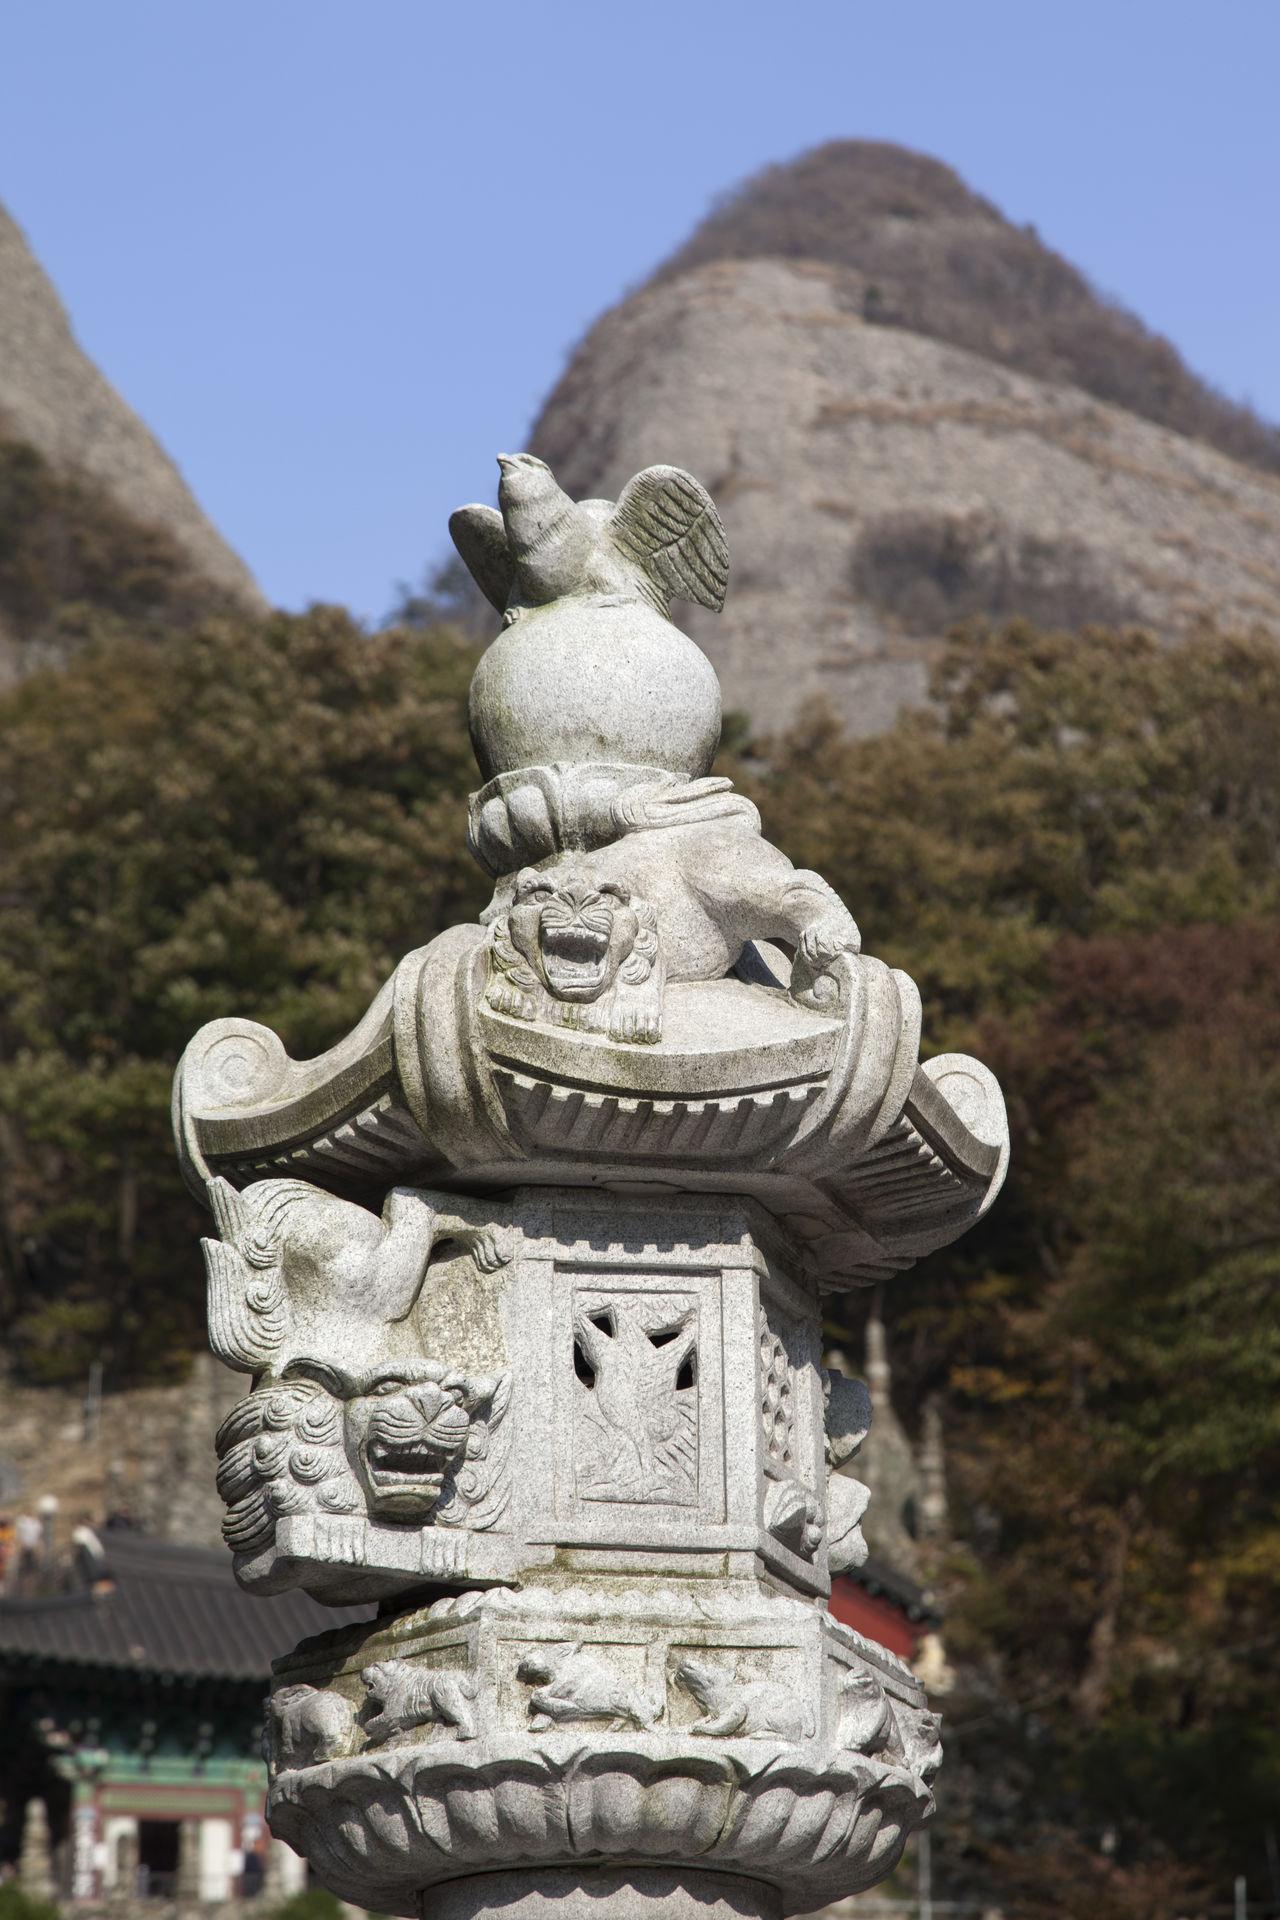 Tapsa, a Buddhism Temple in Maisan, Muan, Jeonbuk, South Korea Buddhism Close-up Day Maisan No People Outdoors Sculpture Sky Statue Tapsa Temple